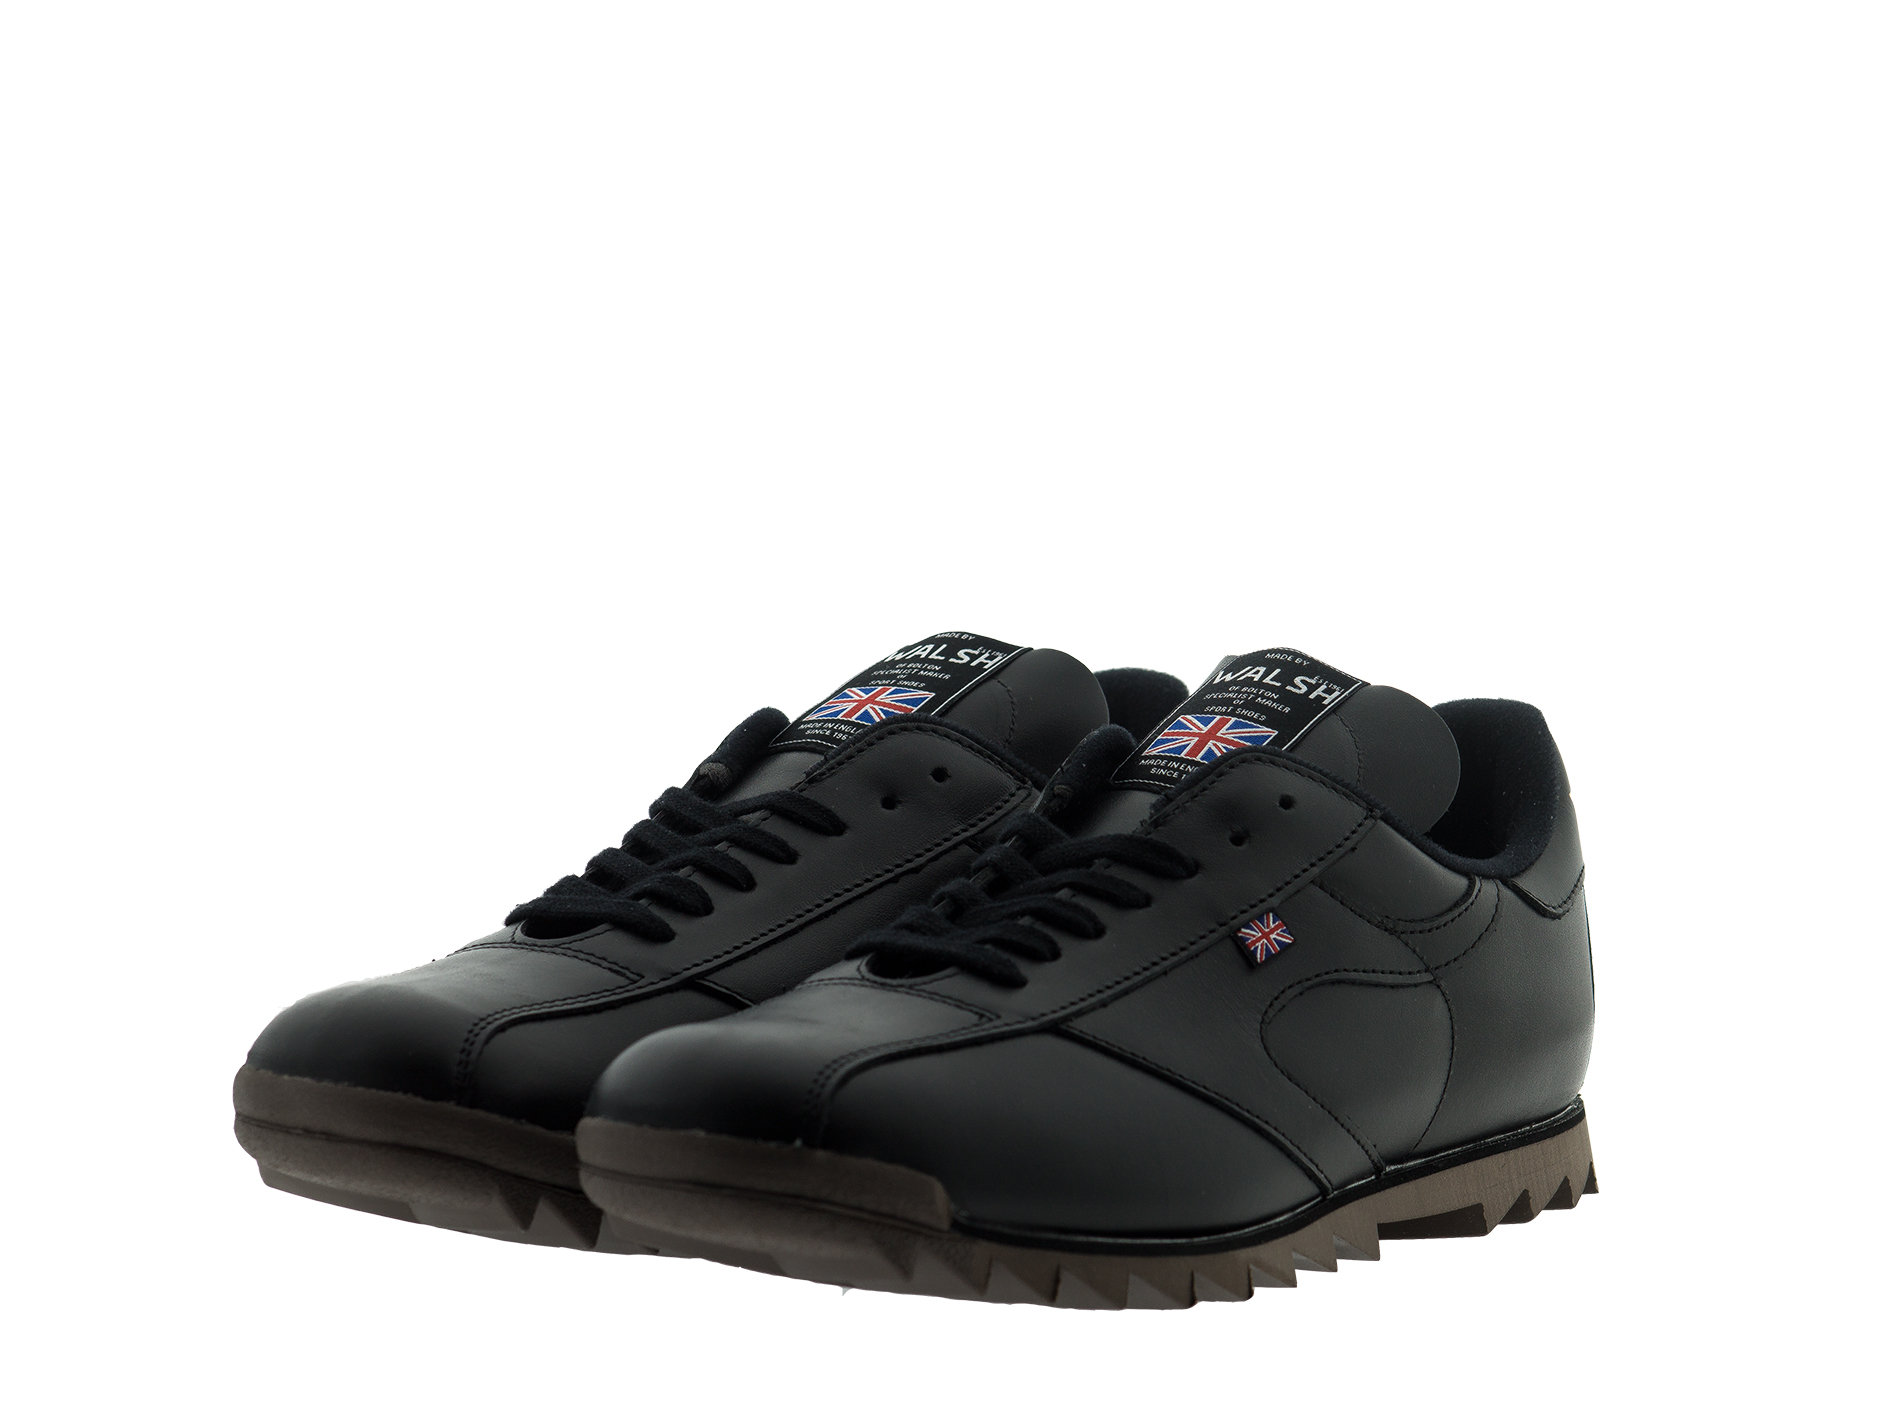 British Made Footwear - Norman Walsh